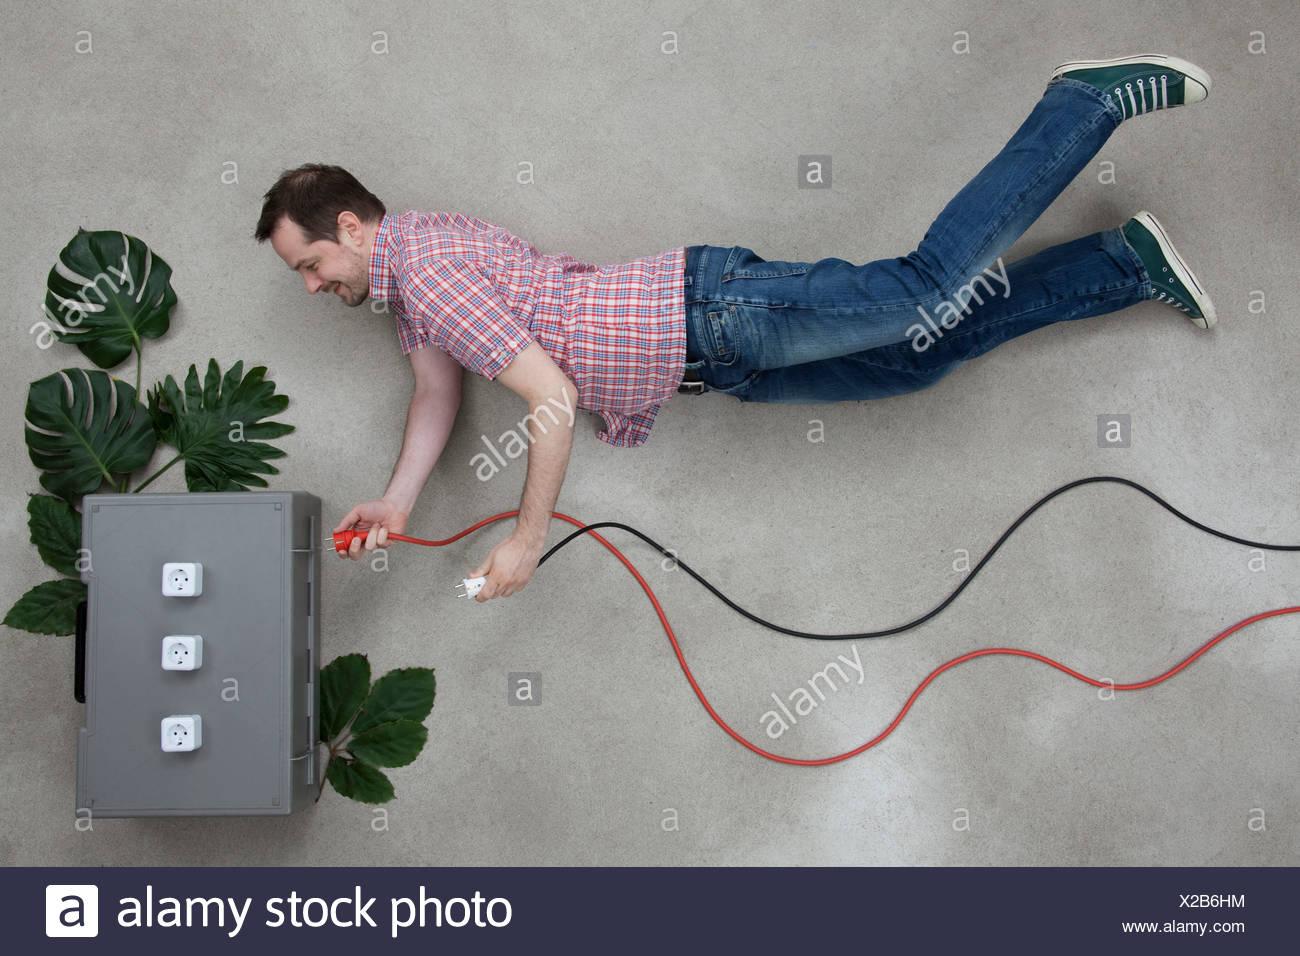 Mid adult man holding plug near electric socket Stock Photo